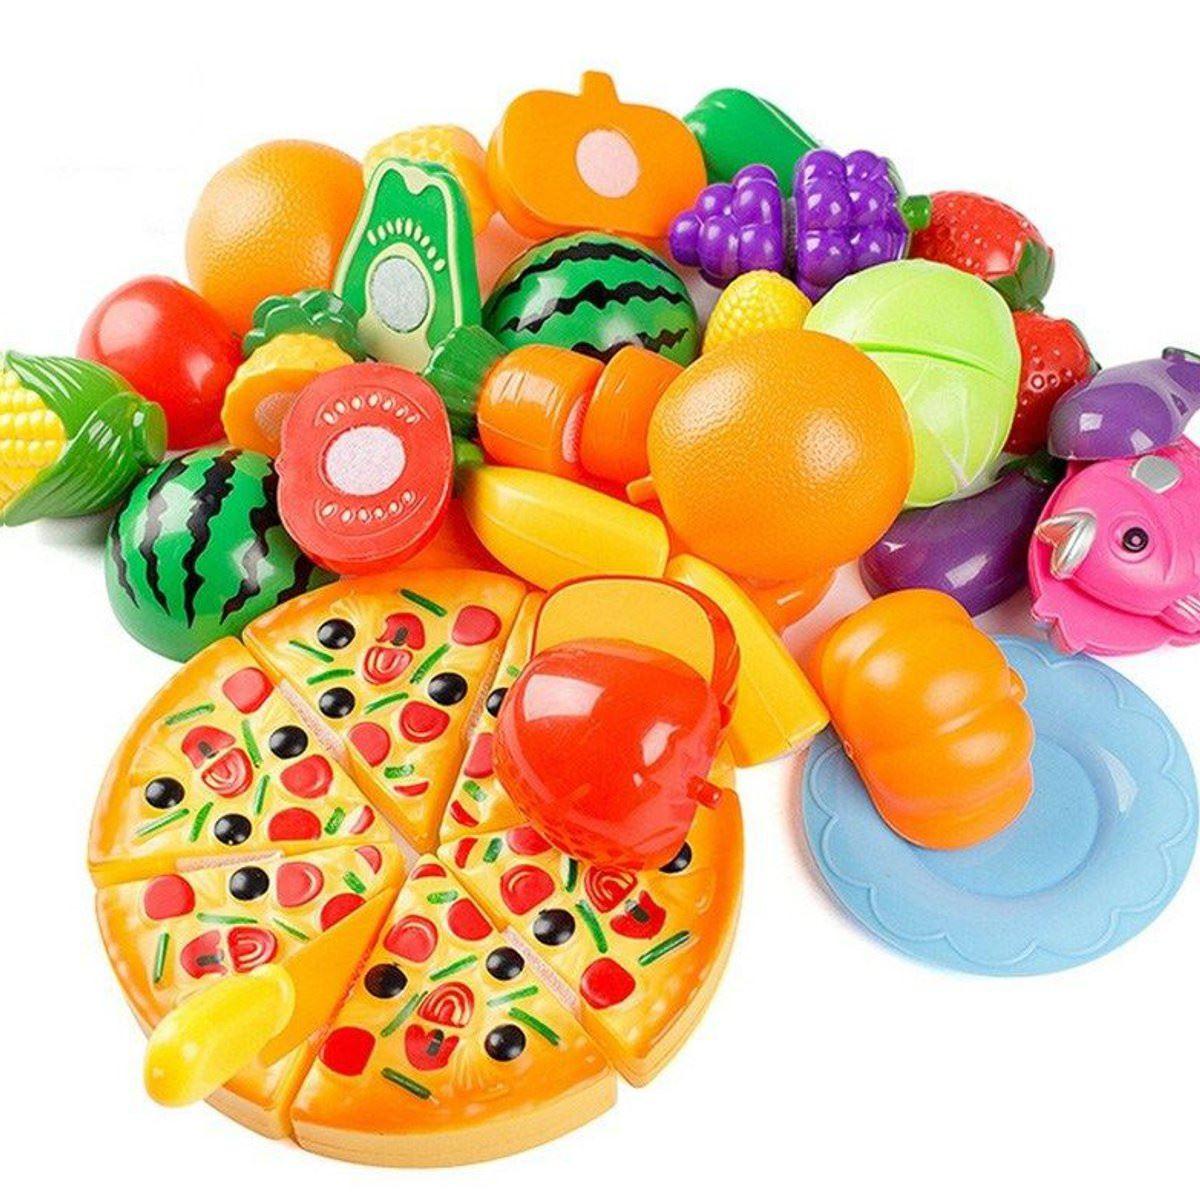 24pcs Set Kitchen Pretend Play Toys Vegetable Fruits